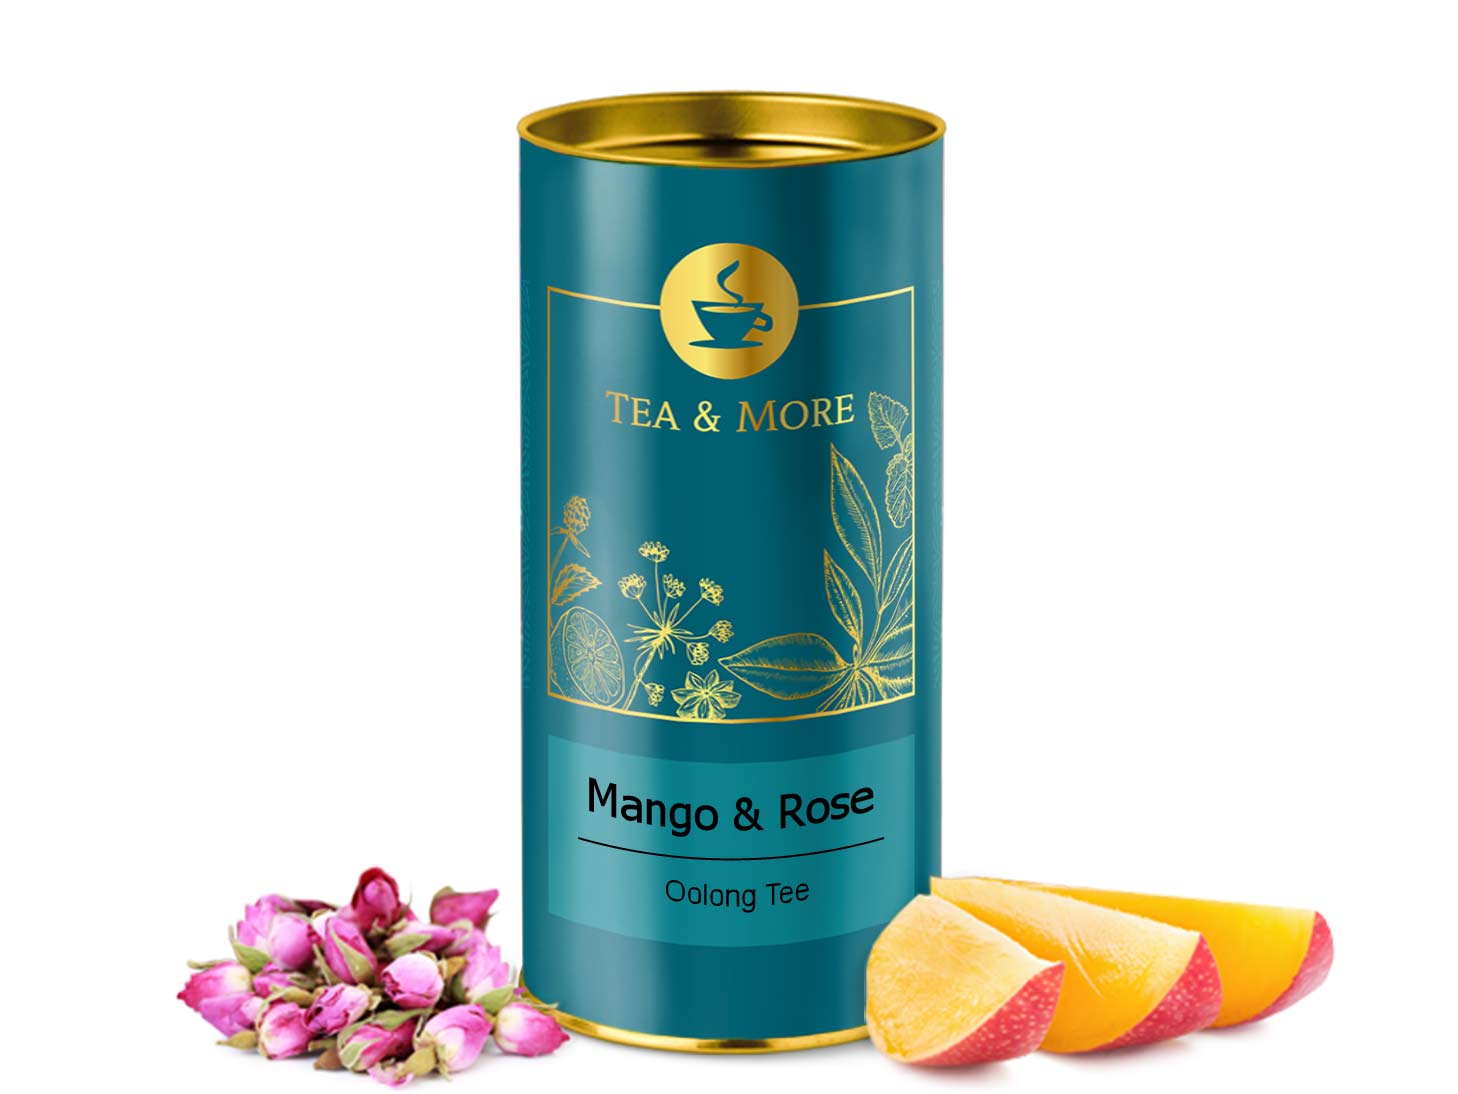 Mango & Rose